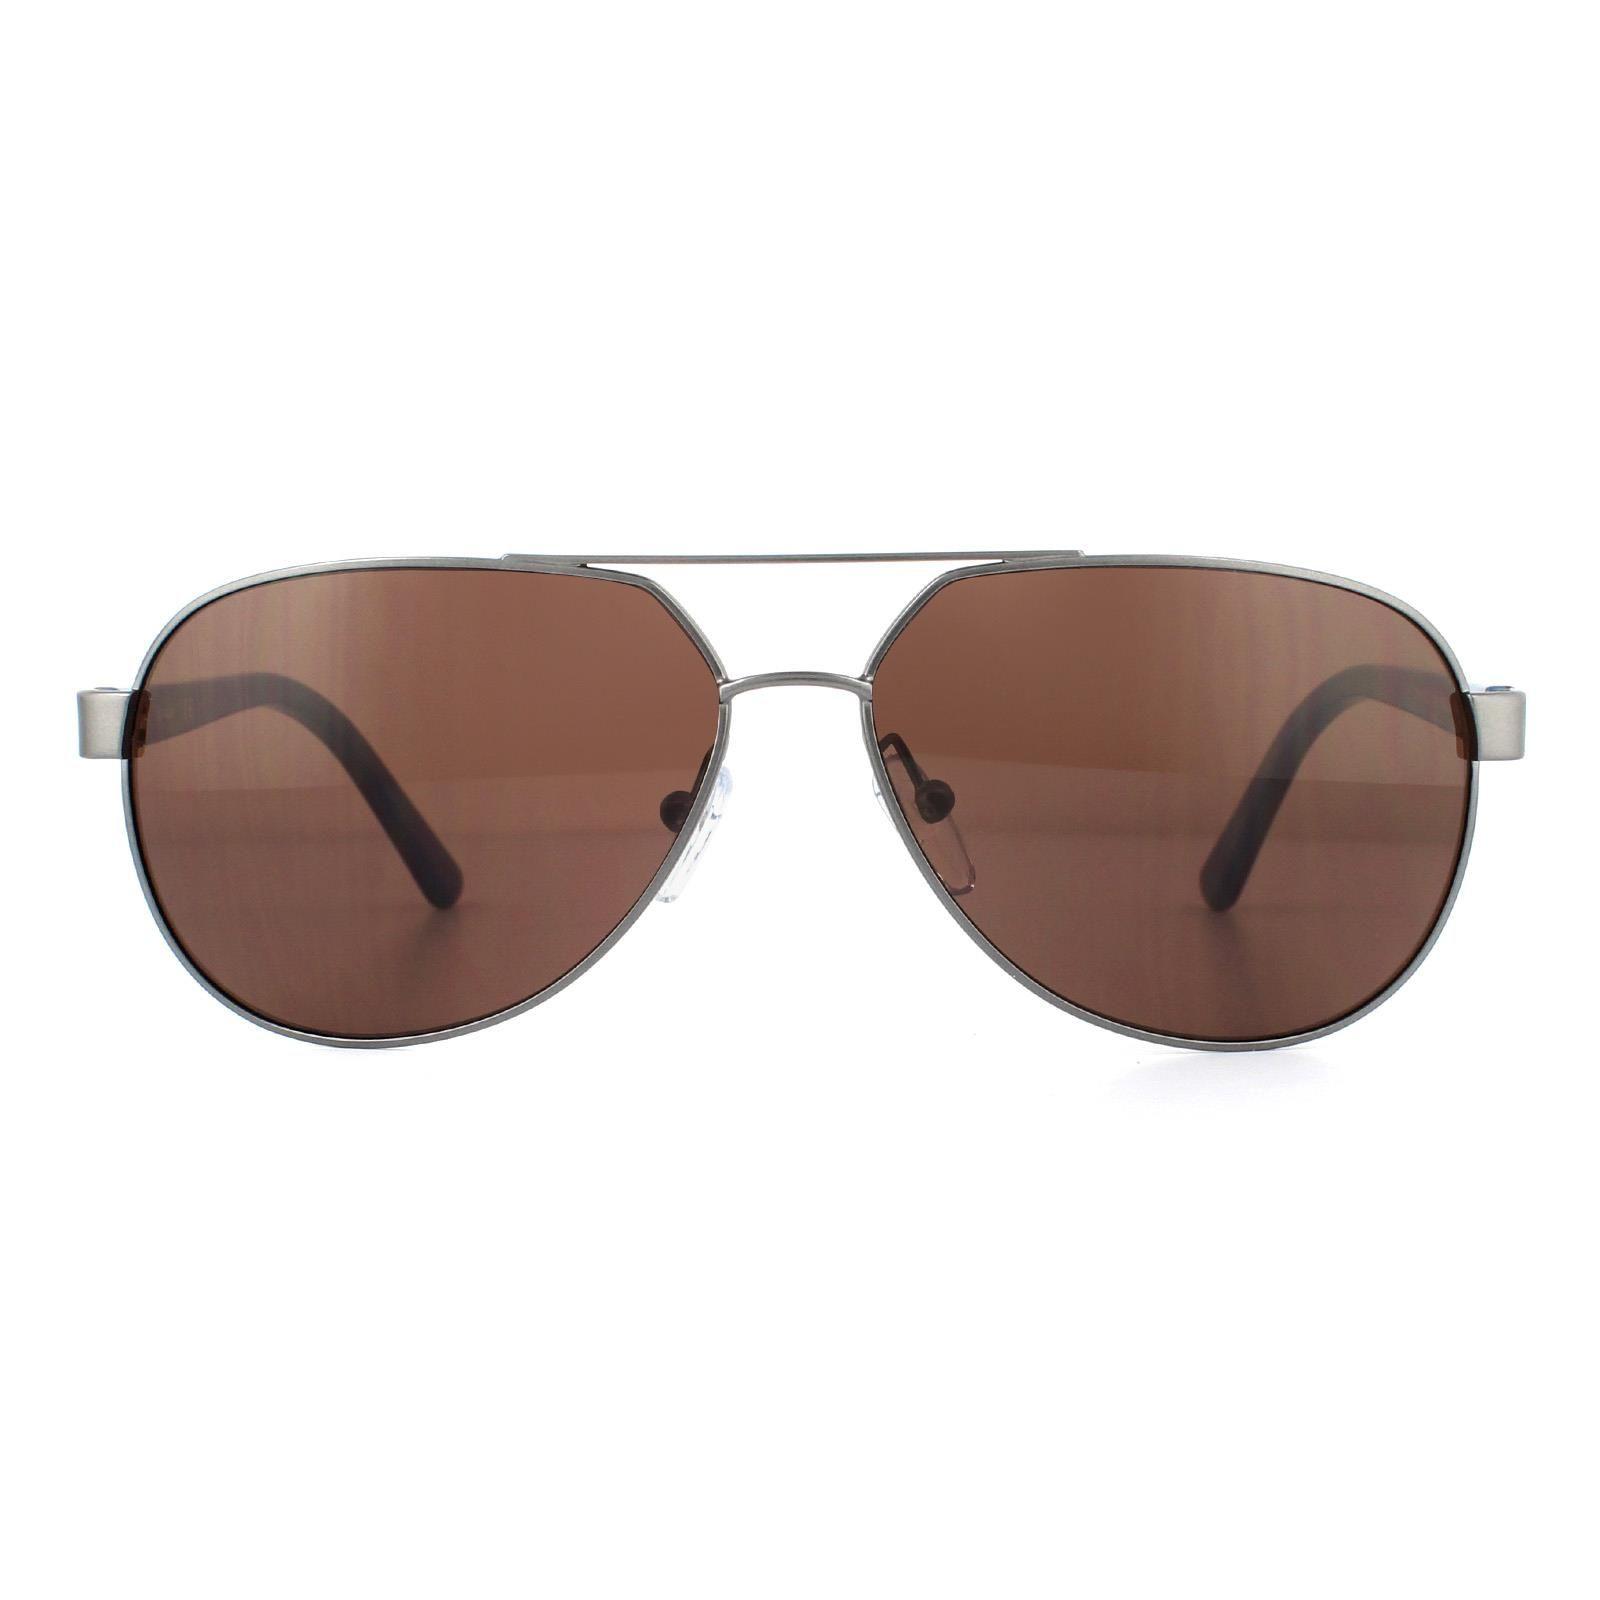 Calvin Klein Sunglasses CK19300S 009 Satin Gunmetal Oxblood Brown